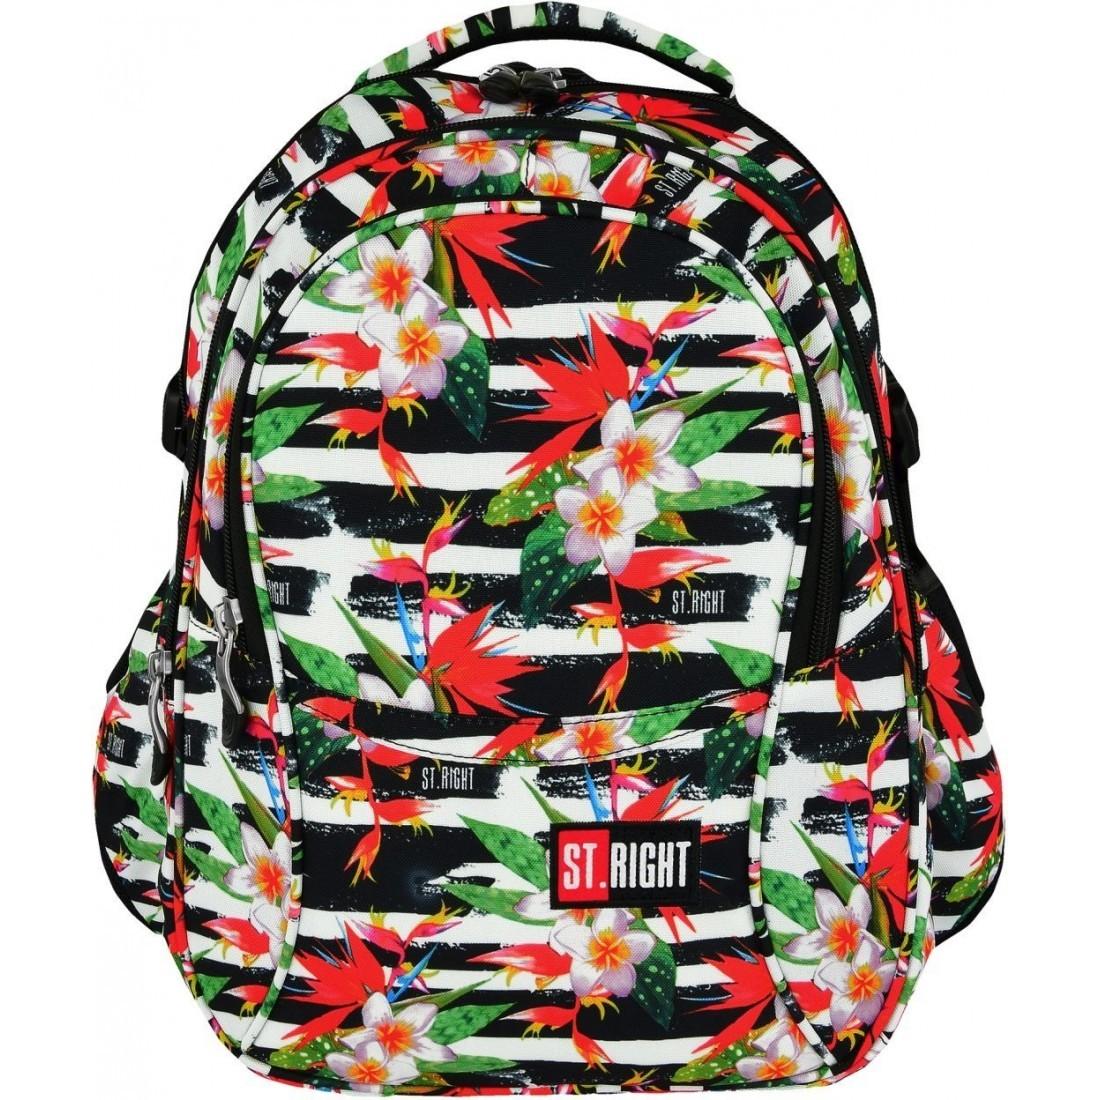 0258088dc983c Plecak szkolny ST.RIGHT TROPICAL STRIPES kwiat hibiskusa dla nastolatek